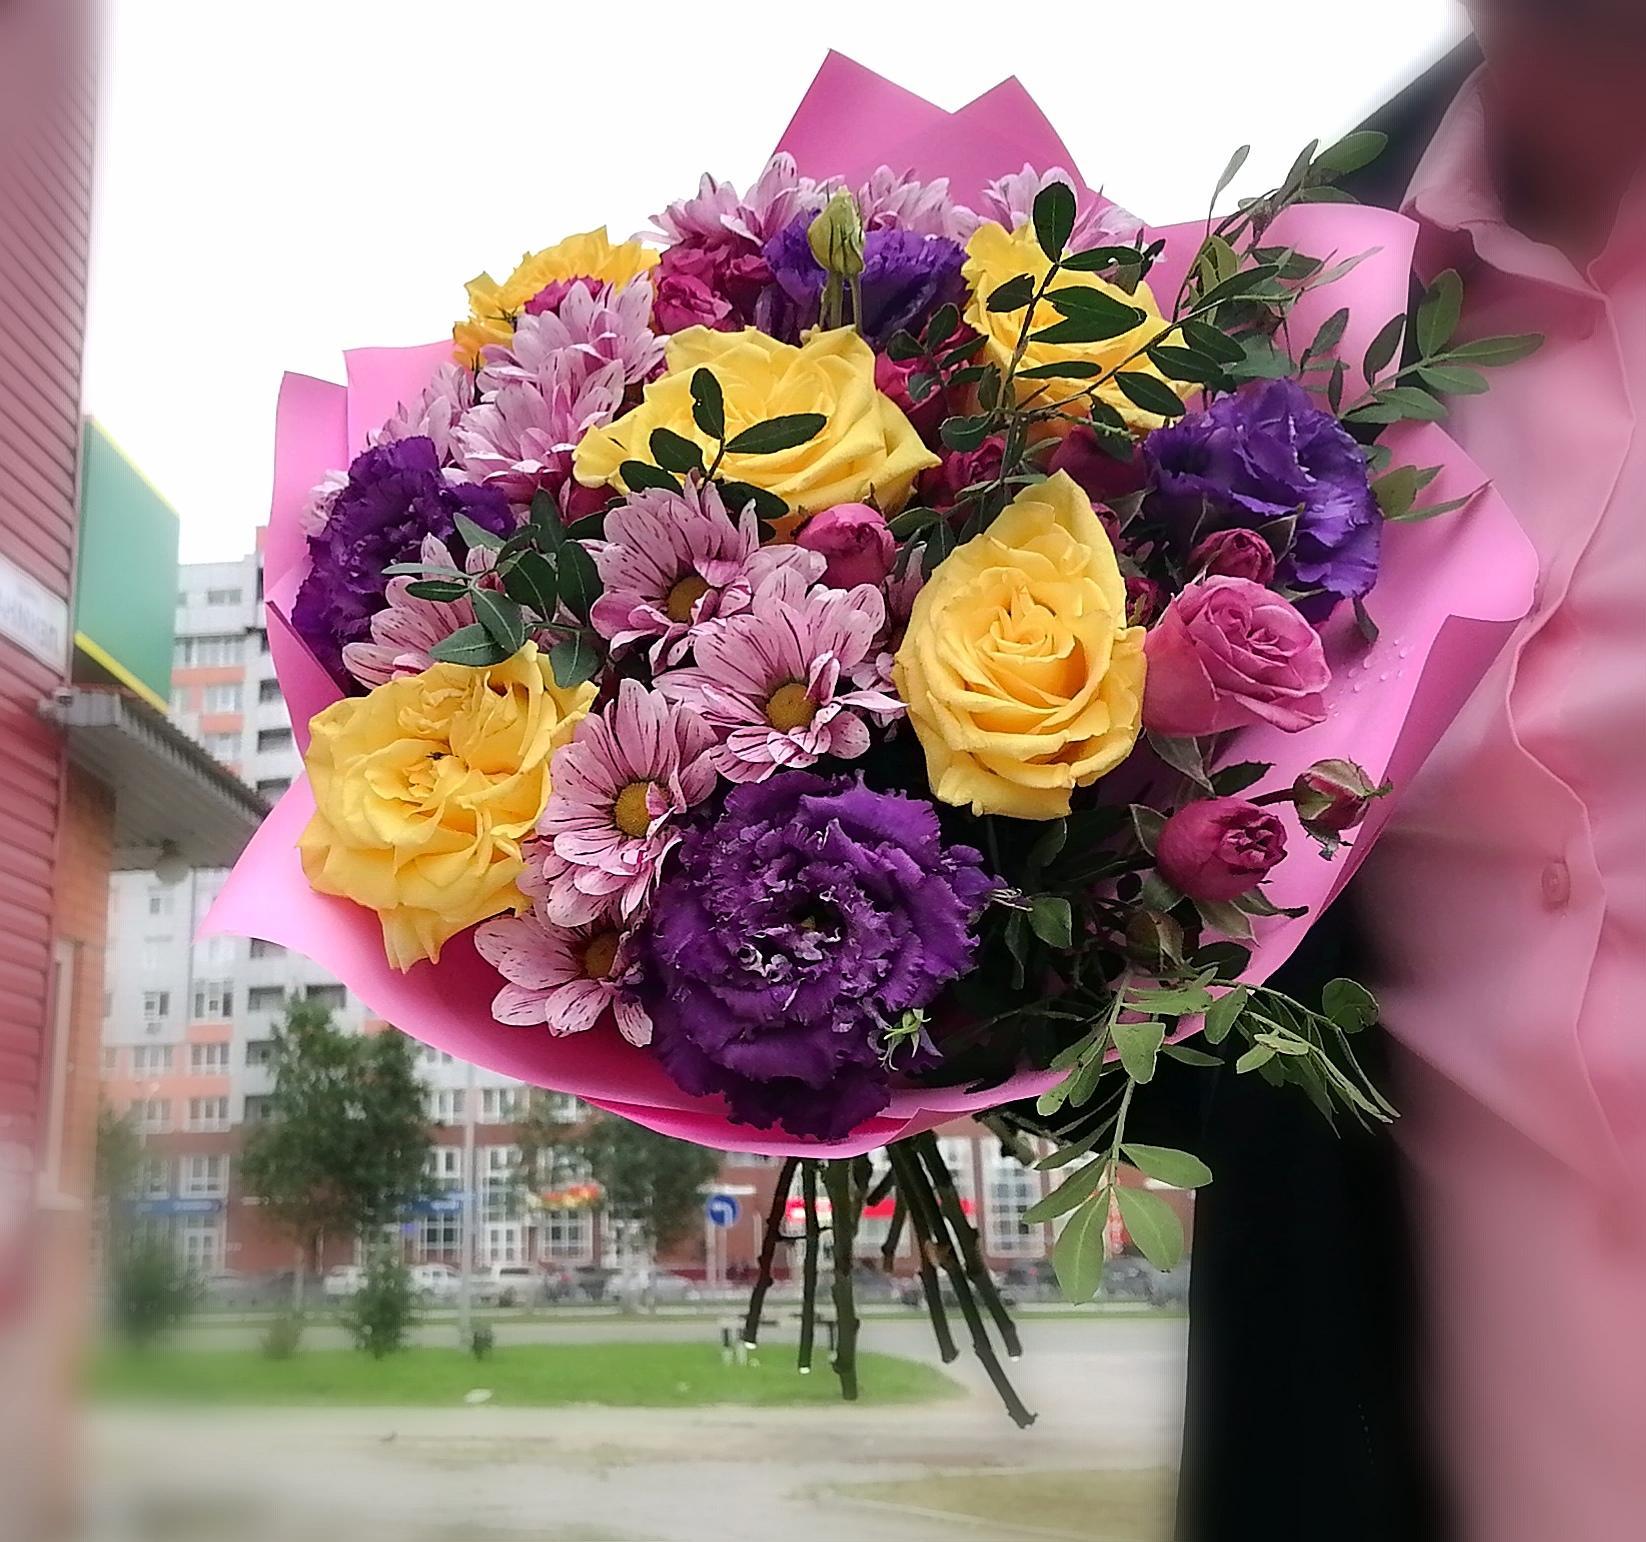 Доставка цветов в г астане, цветов